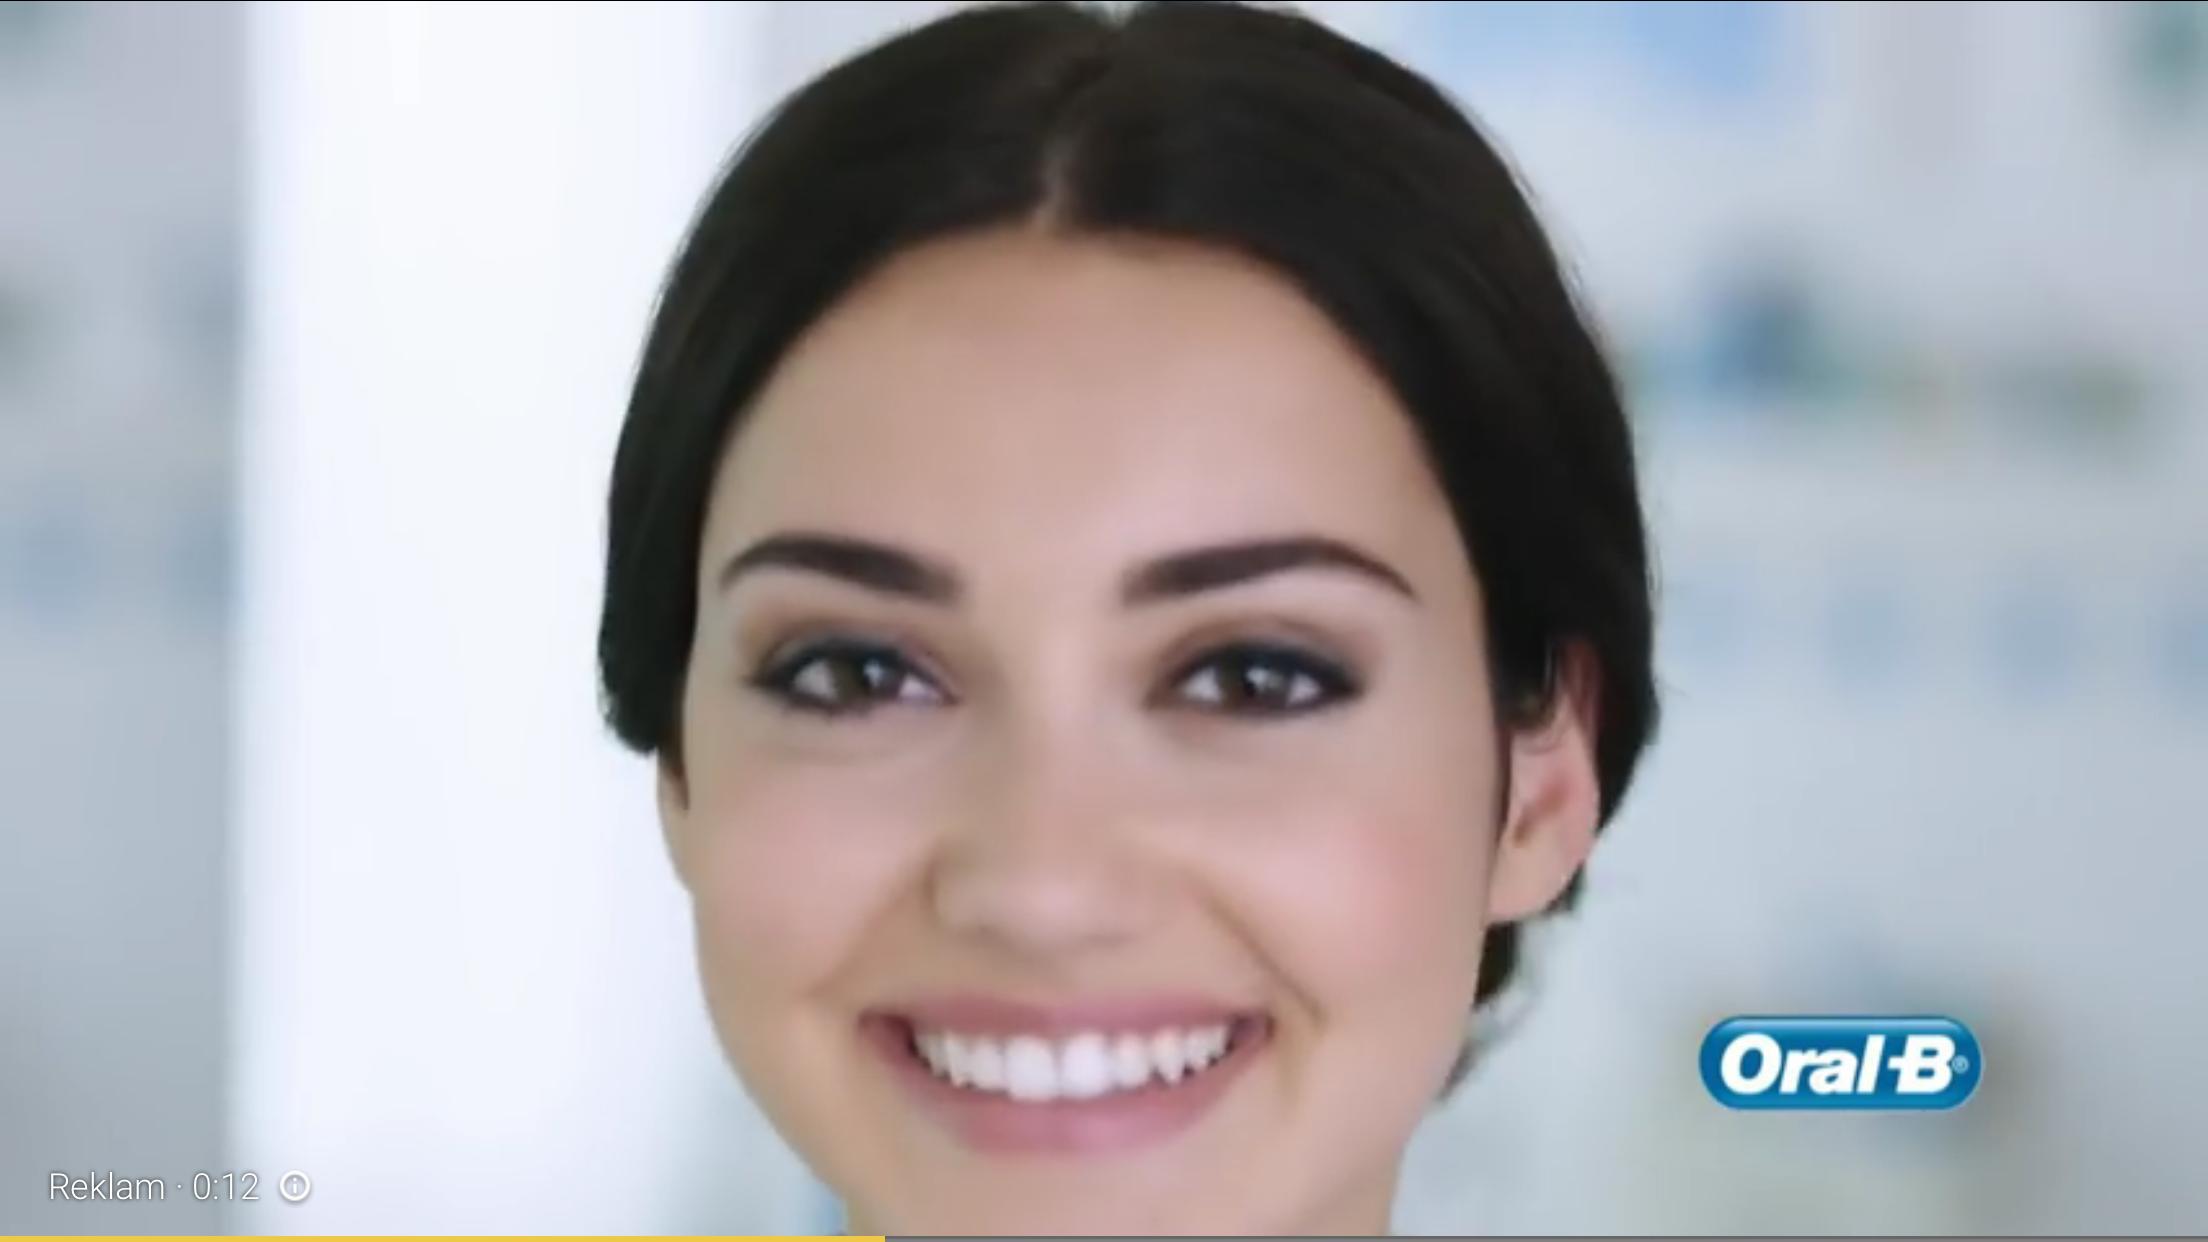 Реклама oral b 12 фотография